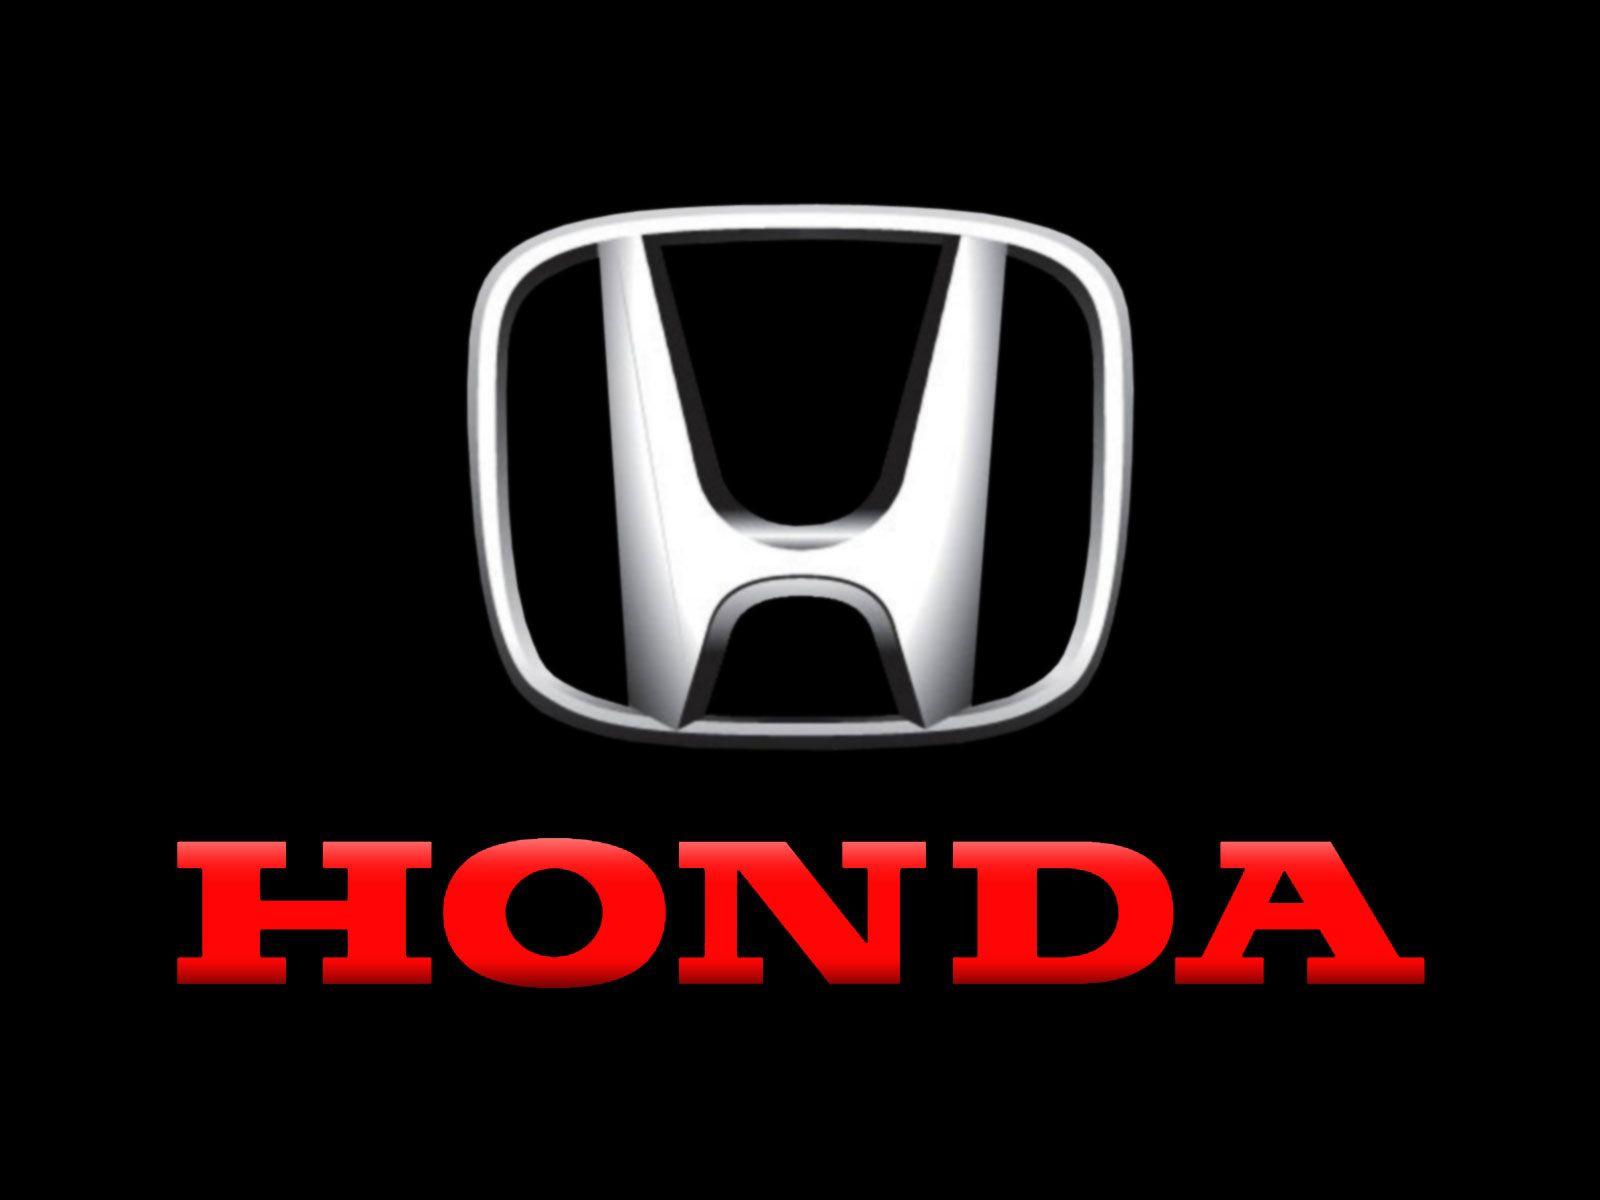 Картинки логотипов хонда